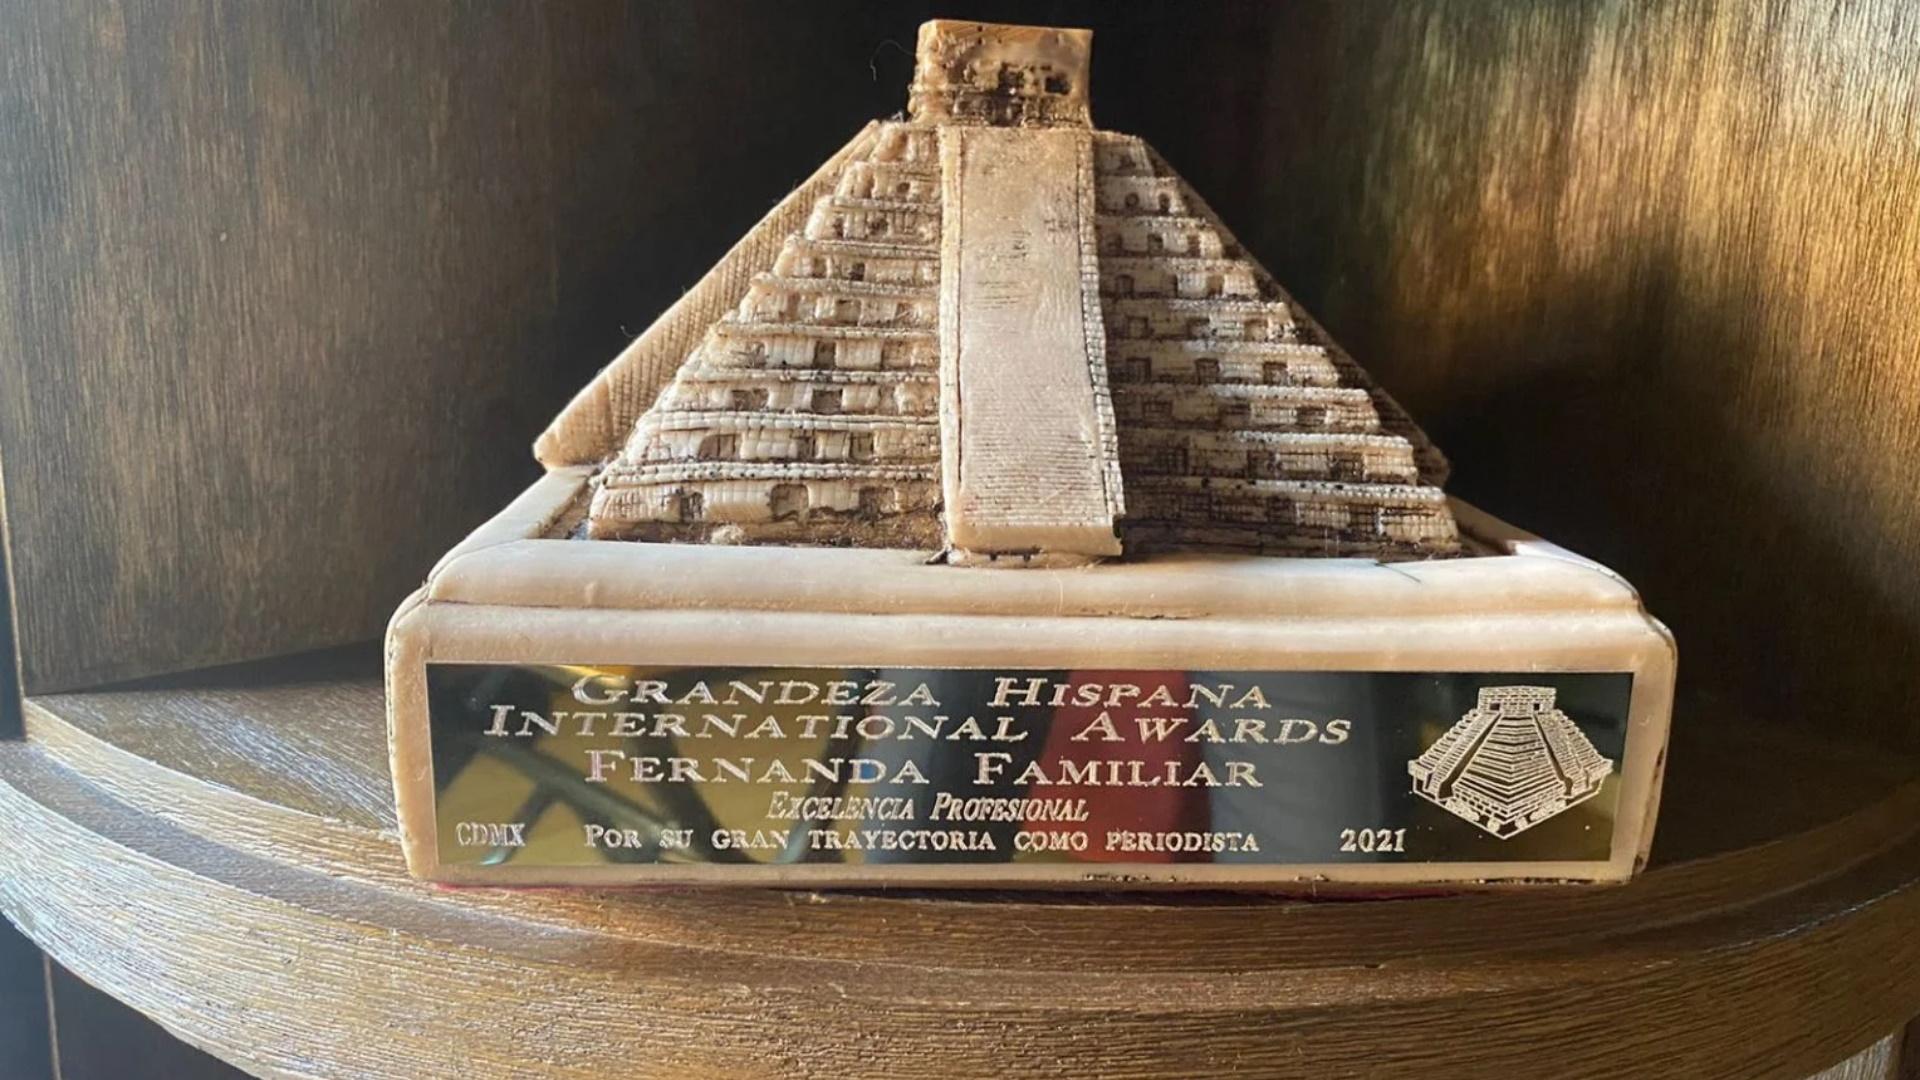 Fernanda Familiar premio Grandeza Hispana International Awards